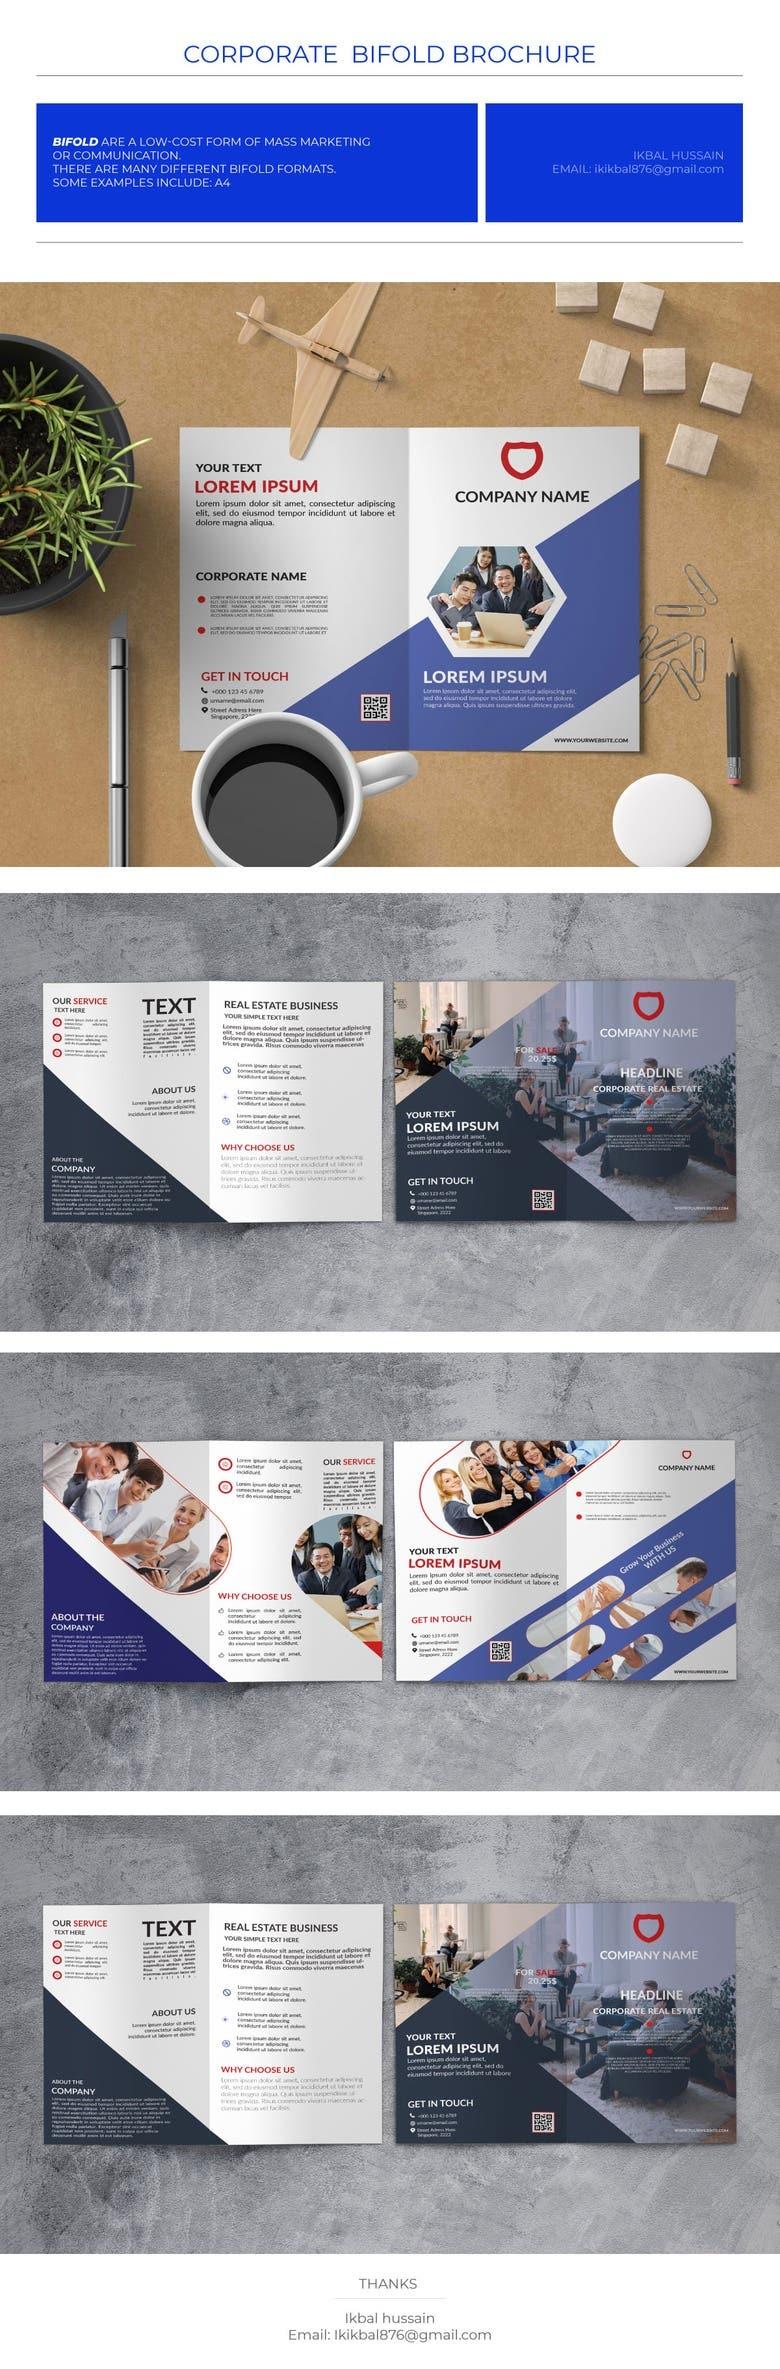 Professional Bi Fold Brochure Design Template Freelancer